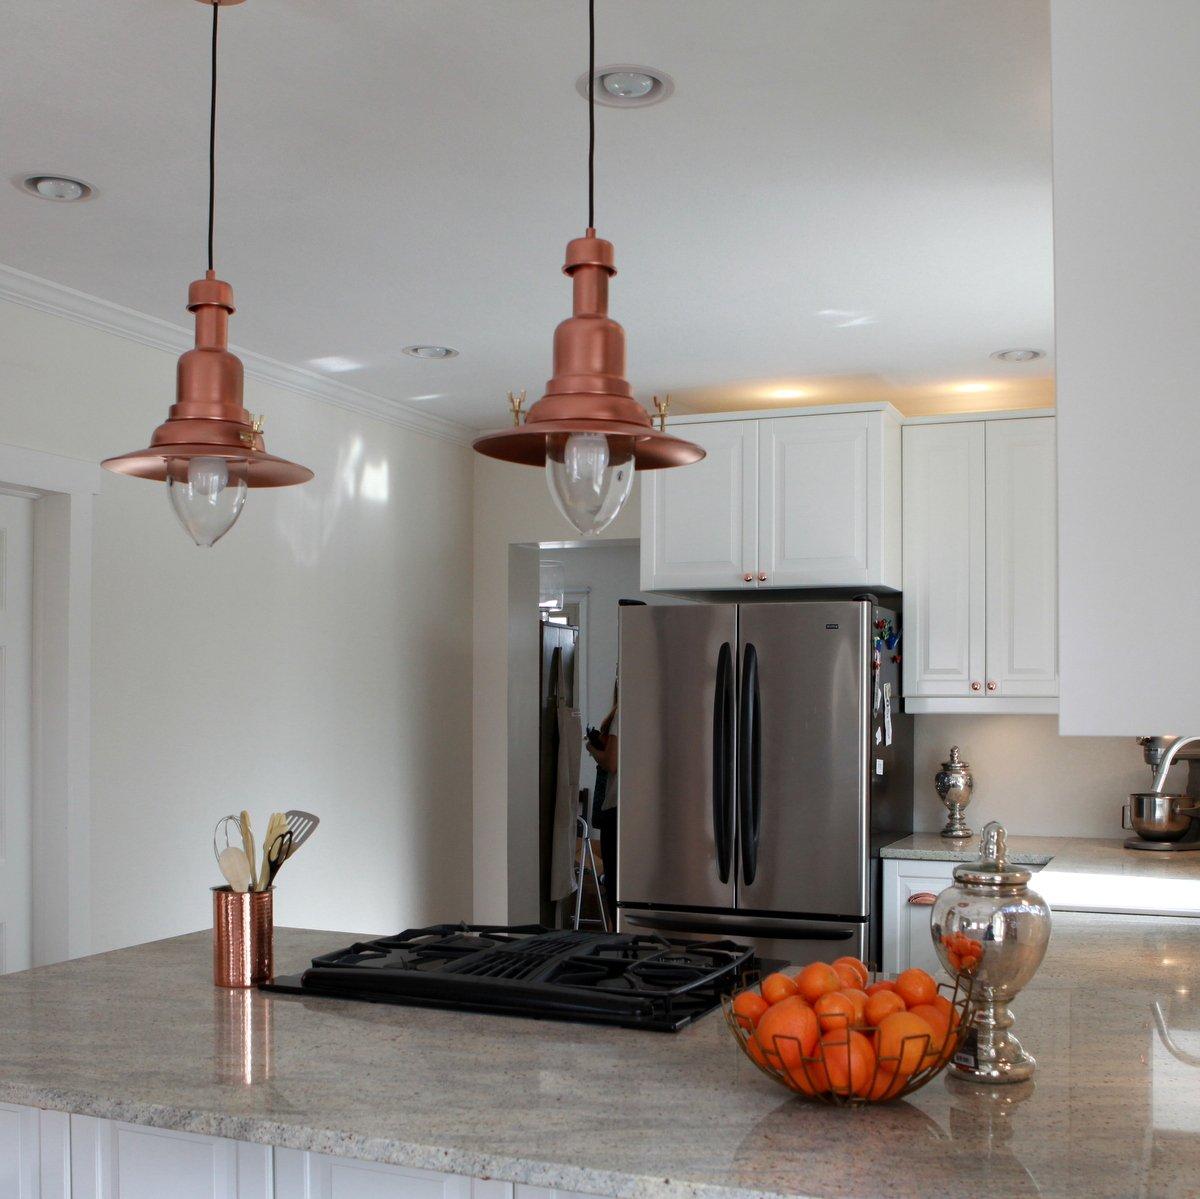 ikea-lampade-sospensione-cucina